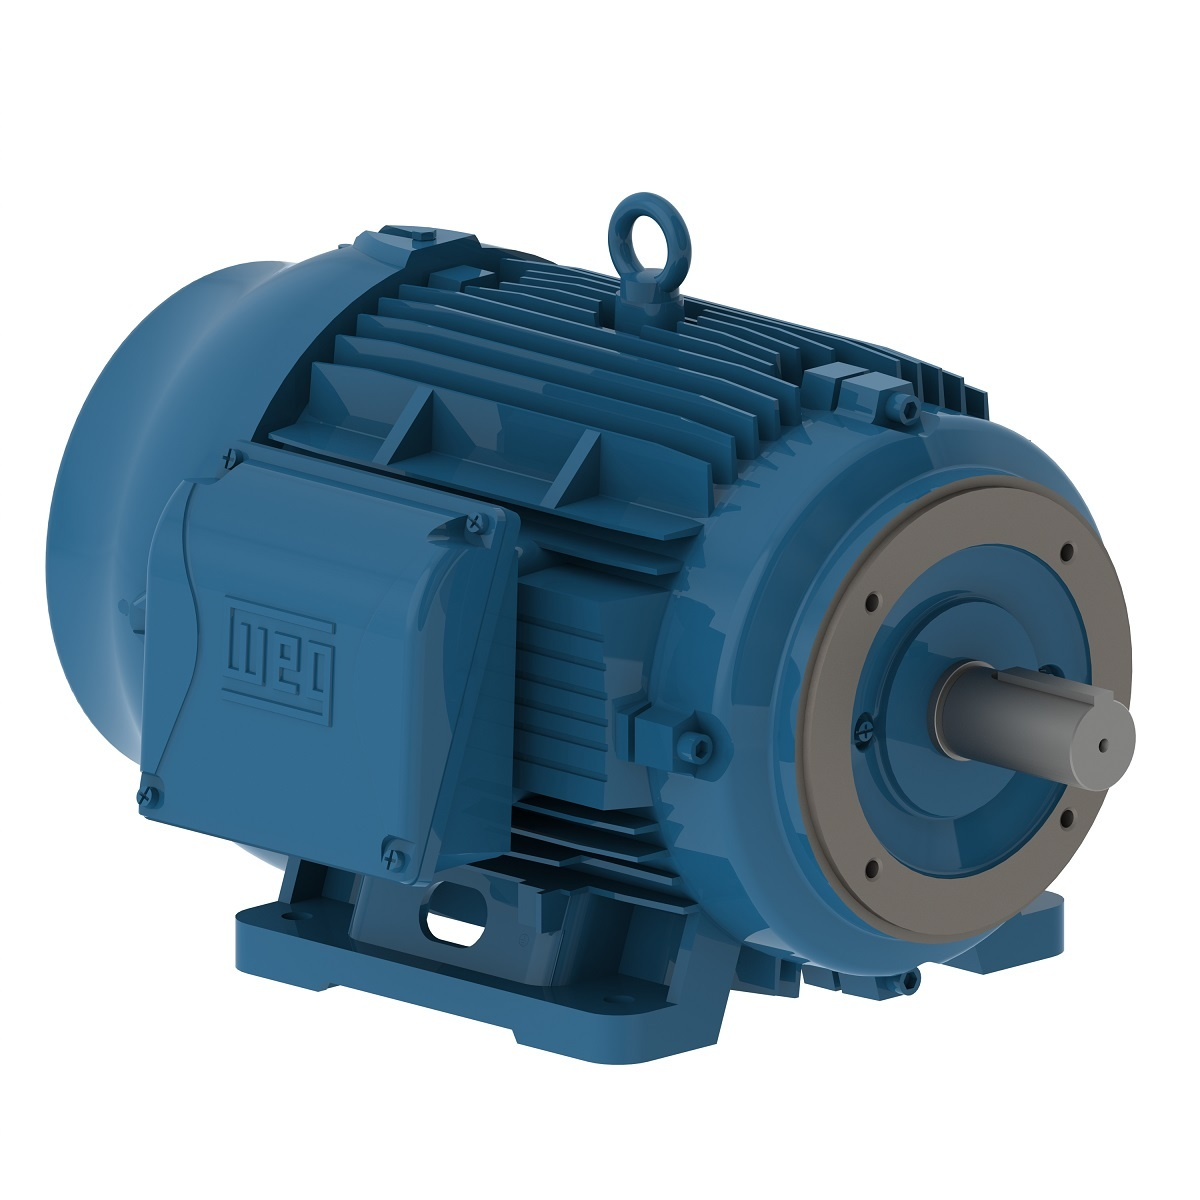 weg fire pump motor wiring diagram 3 way dimmer switch single phase best library w22 nema premium efficiency 100 hp 4p 404 5tc 3ph 208 230 460 380 v rh cc029a great installation